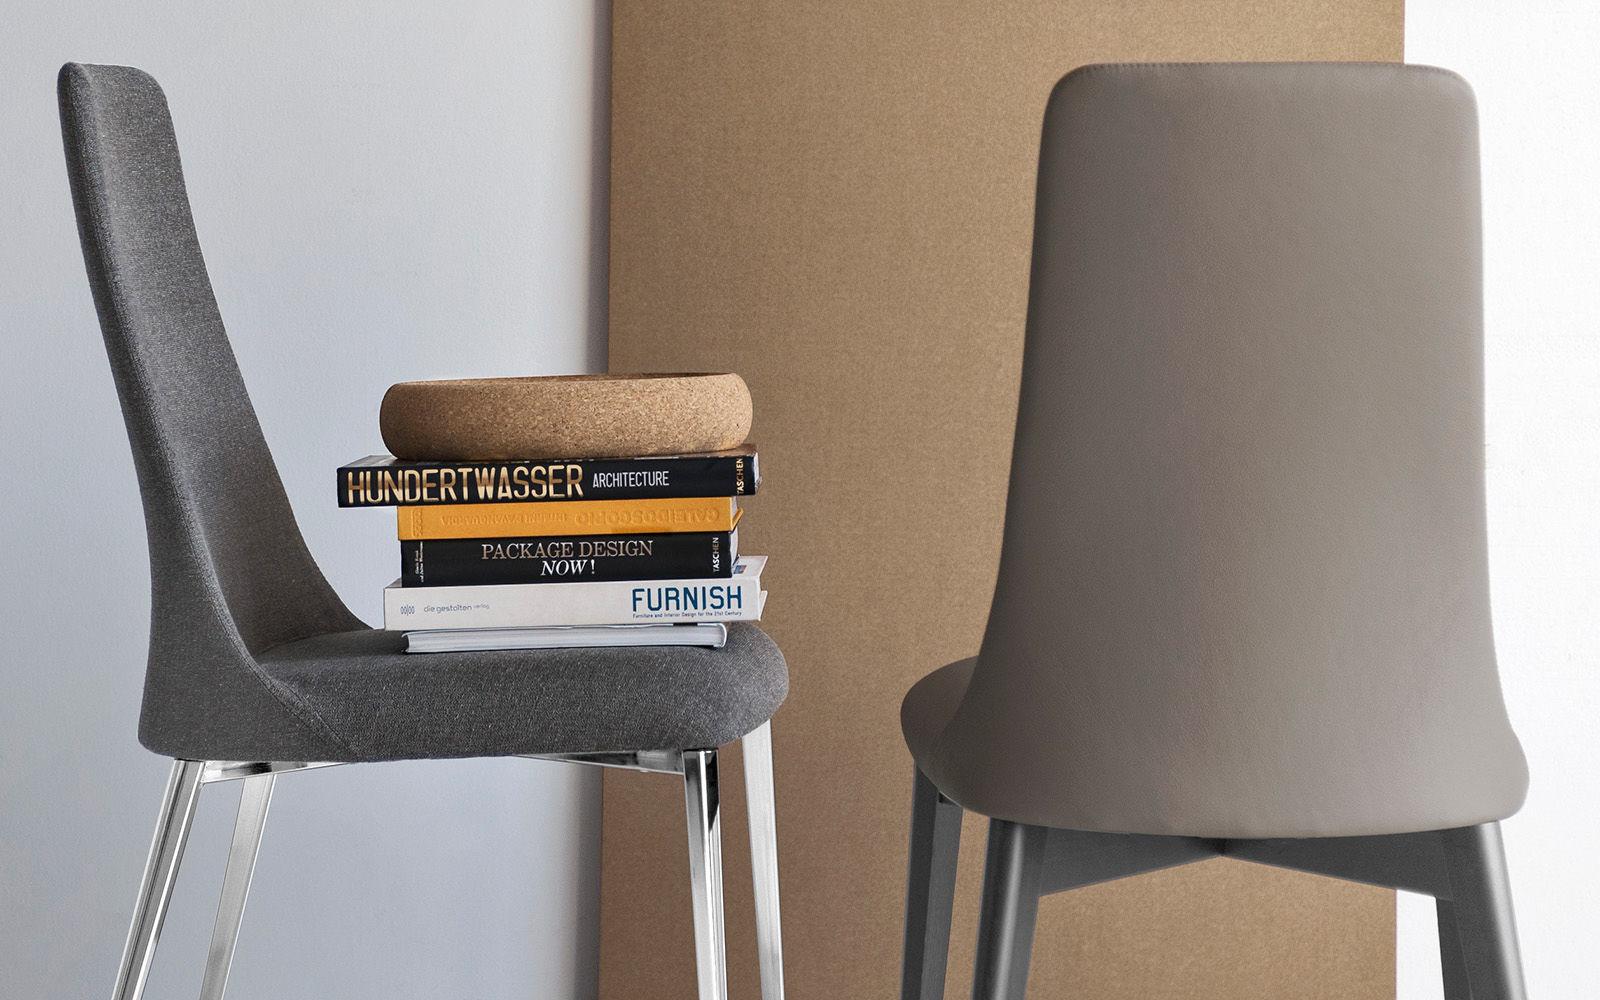 Sedia Imbottita Design : Sedia moderna imbottita con braccioli con schienale alto